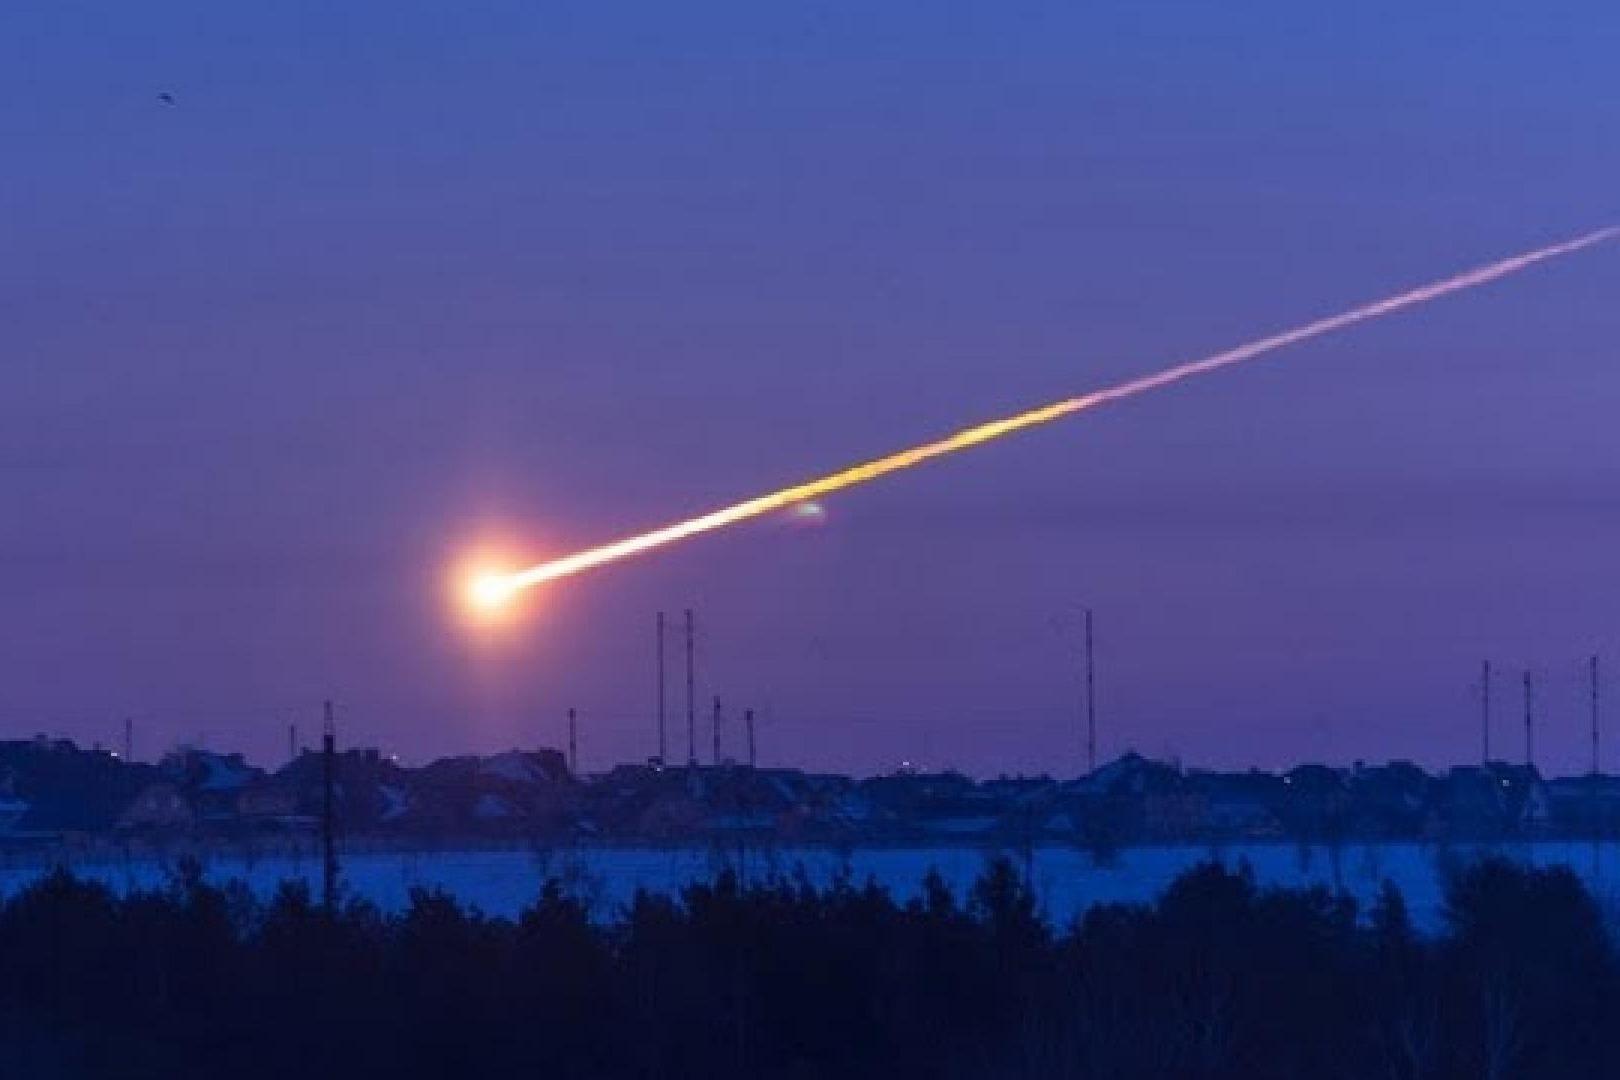 Asteroid belt – asteroid types, activity, largest asteroids ...